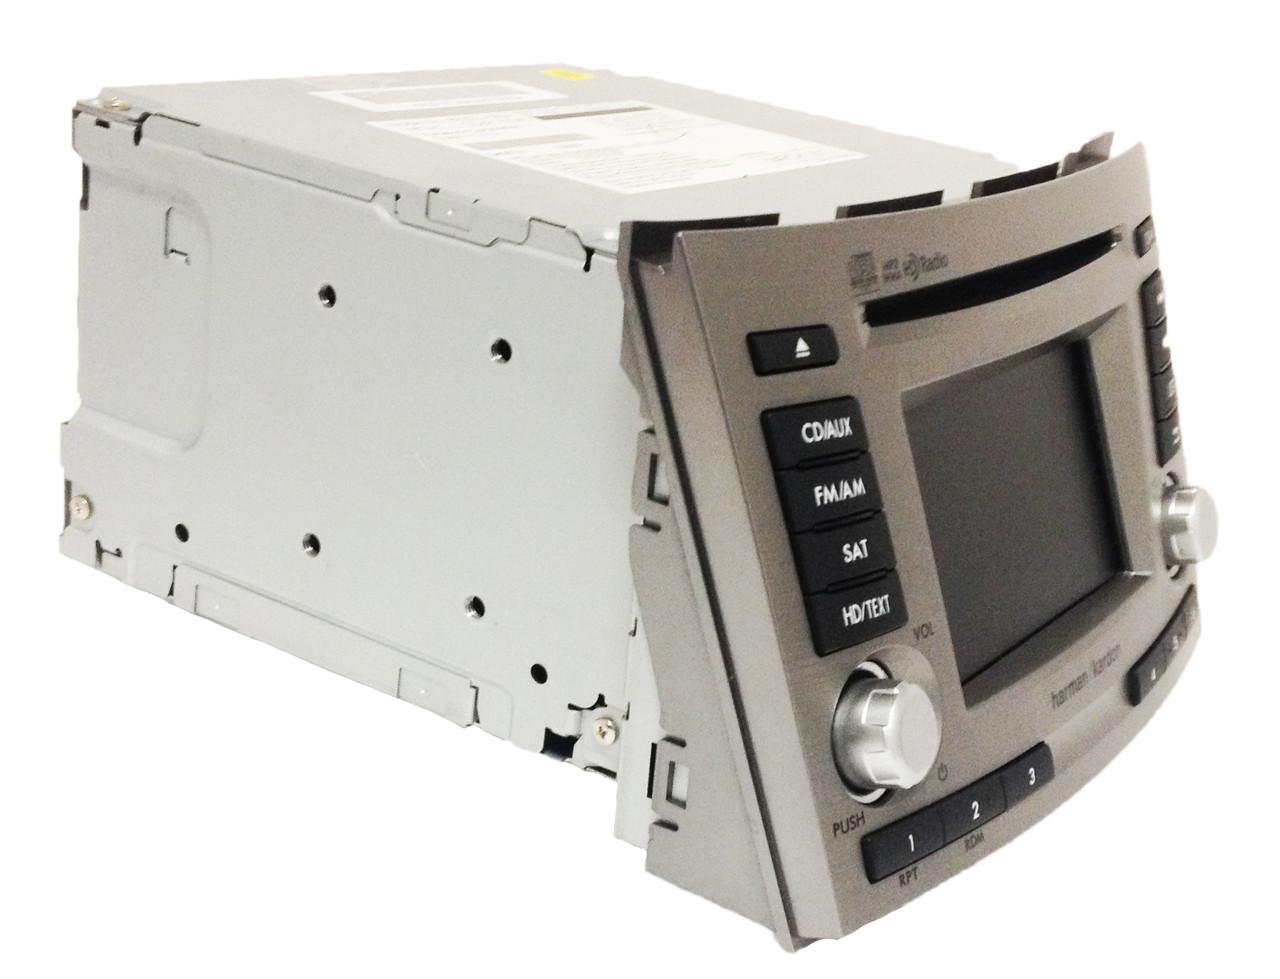 13 14 Subaru Legacy HD HARMAN KARDON Radio Satellite MP3 WMA CD Player  PE658U1